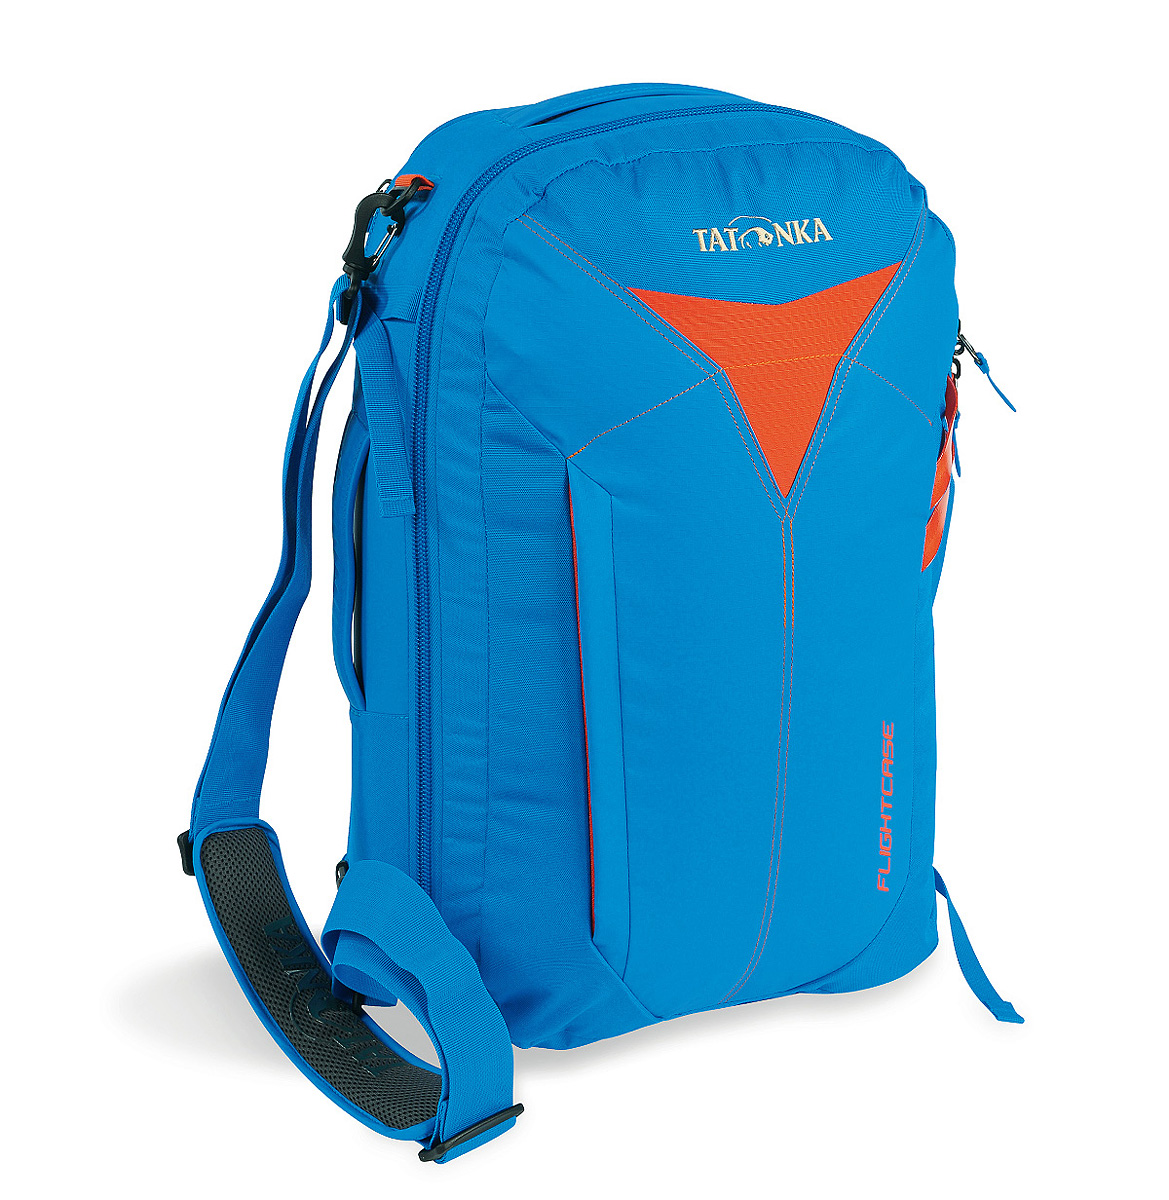 Сумка-рюкзак для путешествий Tatonka Flightcase, цвет: ярко-синий, 38 л сумка для фотокамеры tatonka protection pouch l